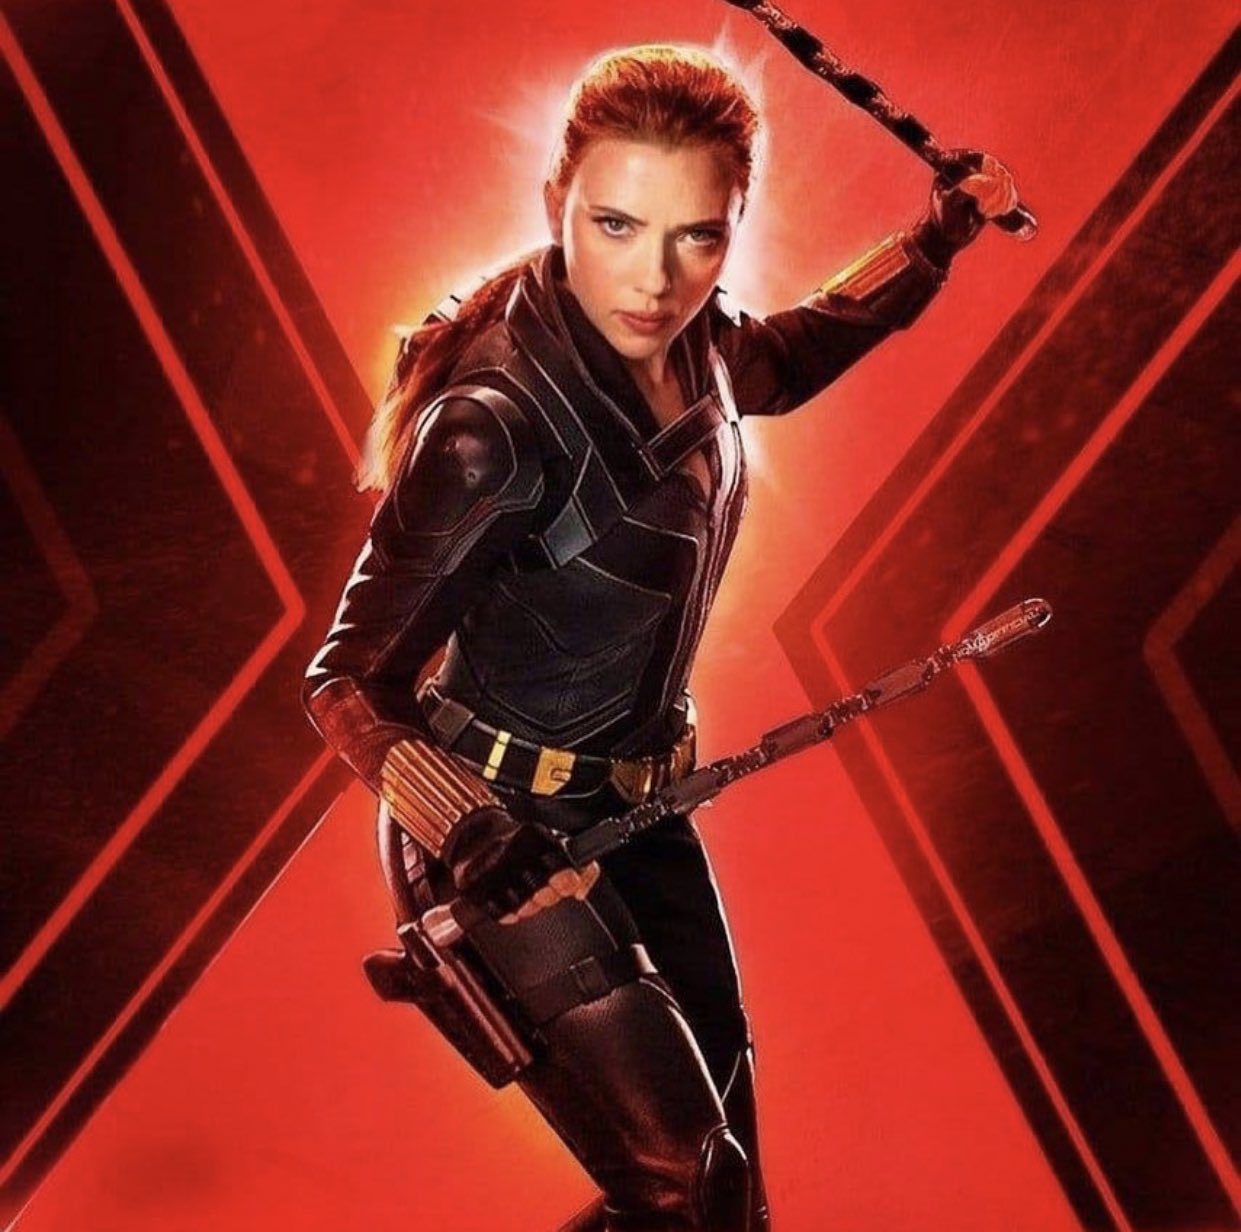 Scarlett Johansson como Natasha Romanoff/Black Widow en una arte promocional de Black Widow (2020). Imagen: Black Widow Movie Twitter (@BlackWidow_Film).